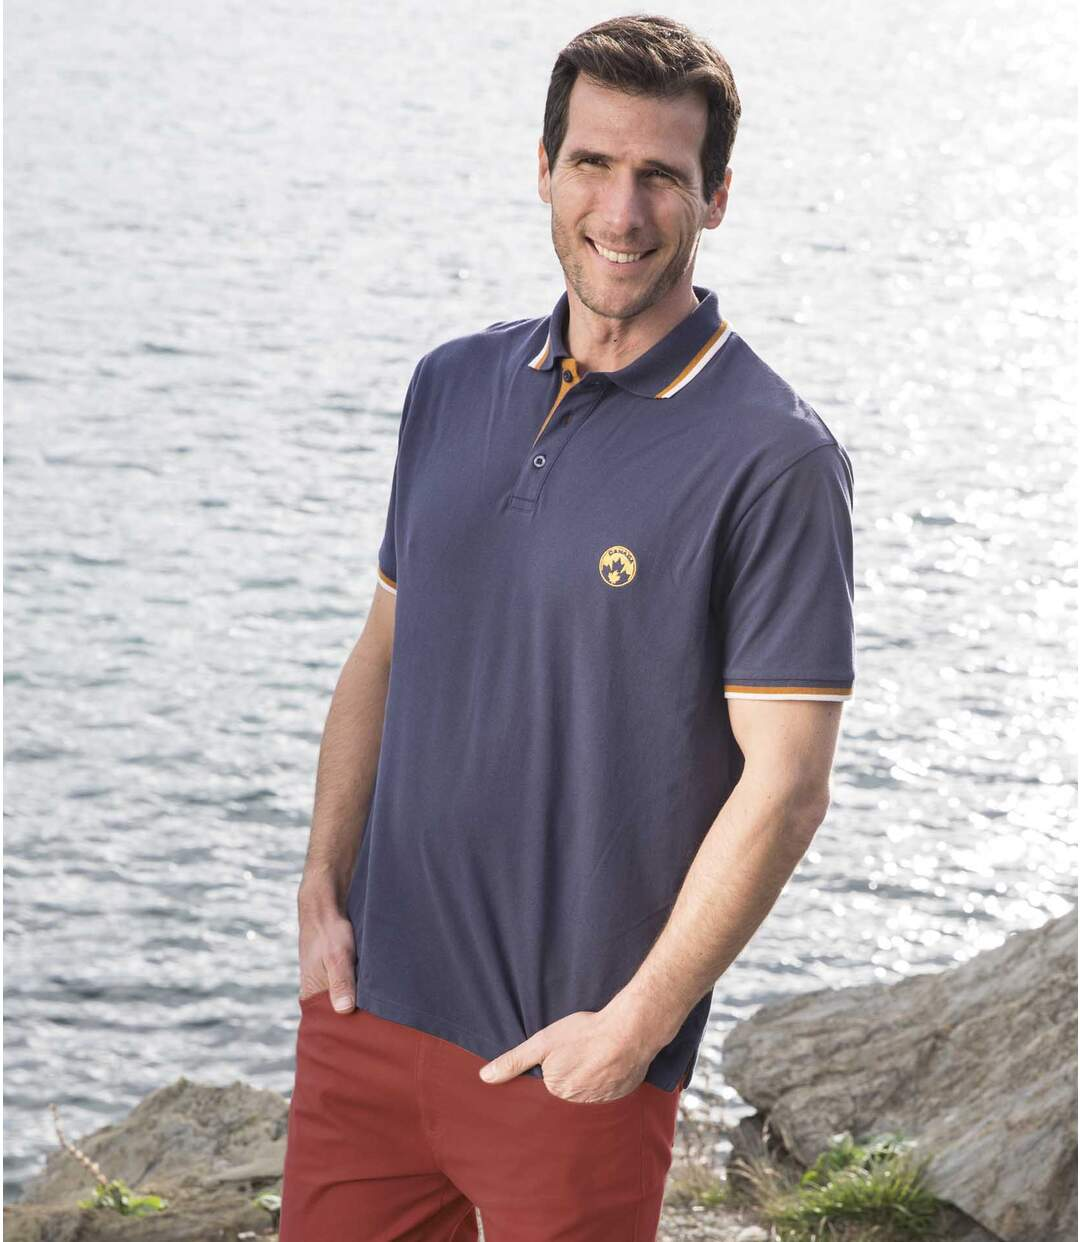 Pack of 2 Men's Piqué Polo Shirts - Navy Grey - Short Sleeves